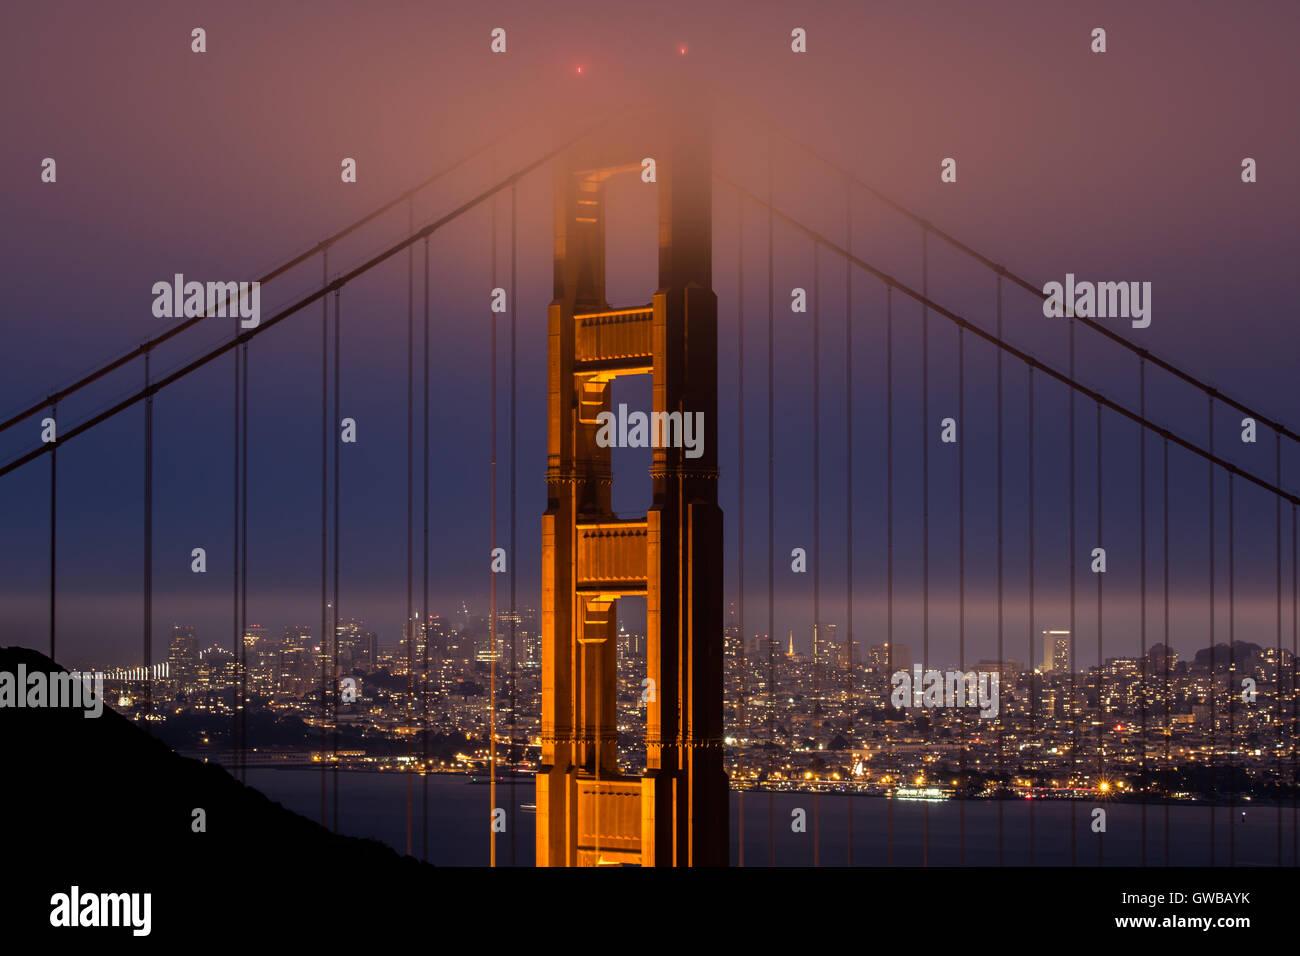 Puente Golden Gate de Kirby Cove, San Francisco, California, EE.UU. Imagen De Stock